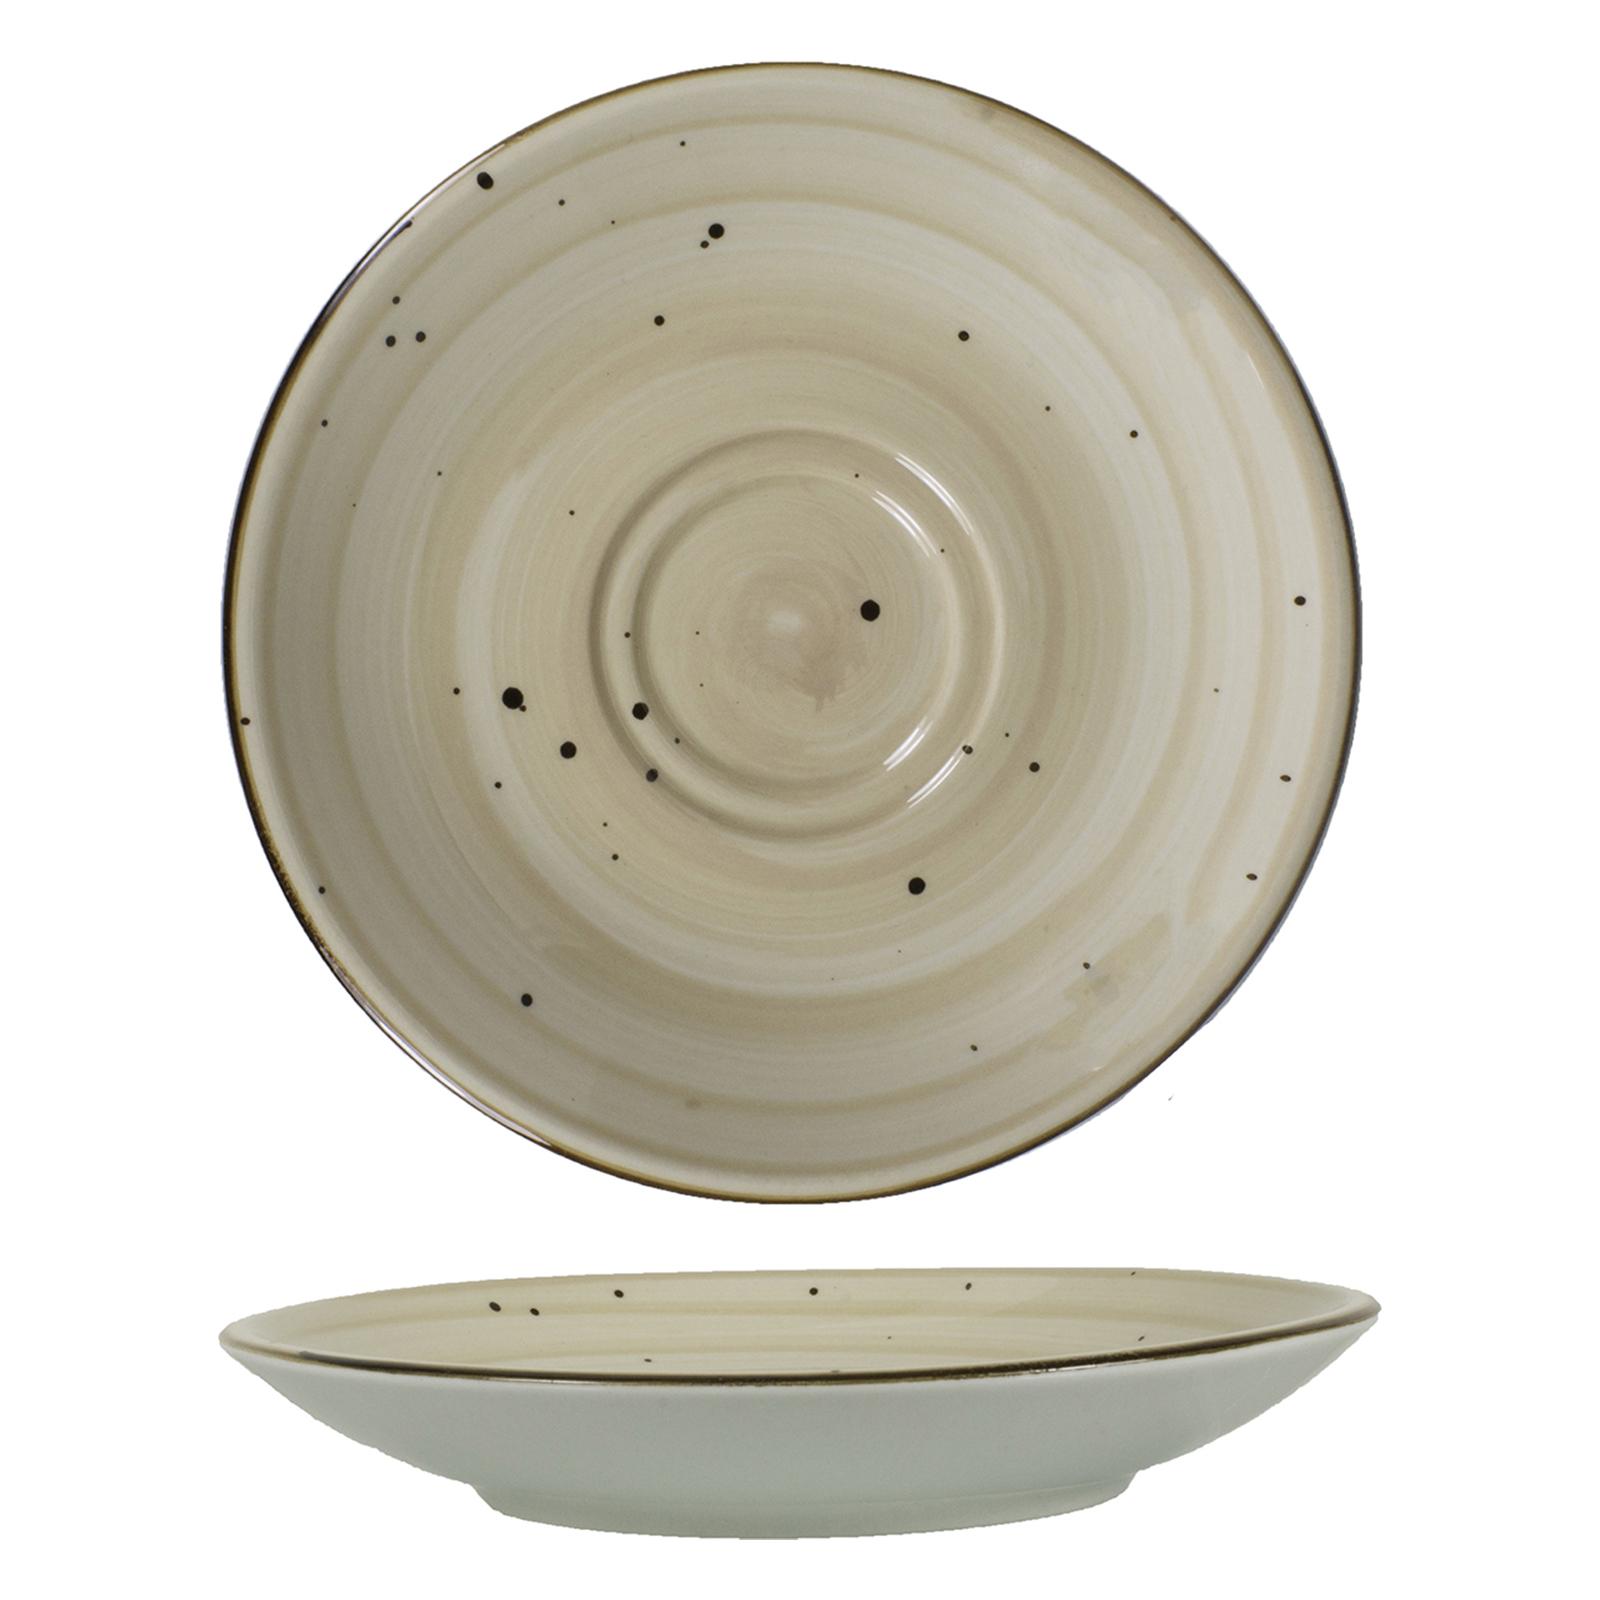 International Tableware RT-2-WH saucer, china